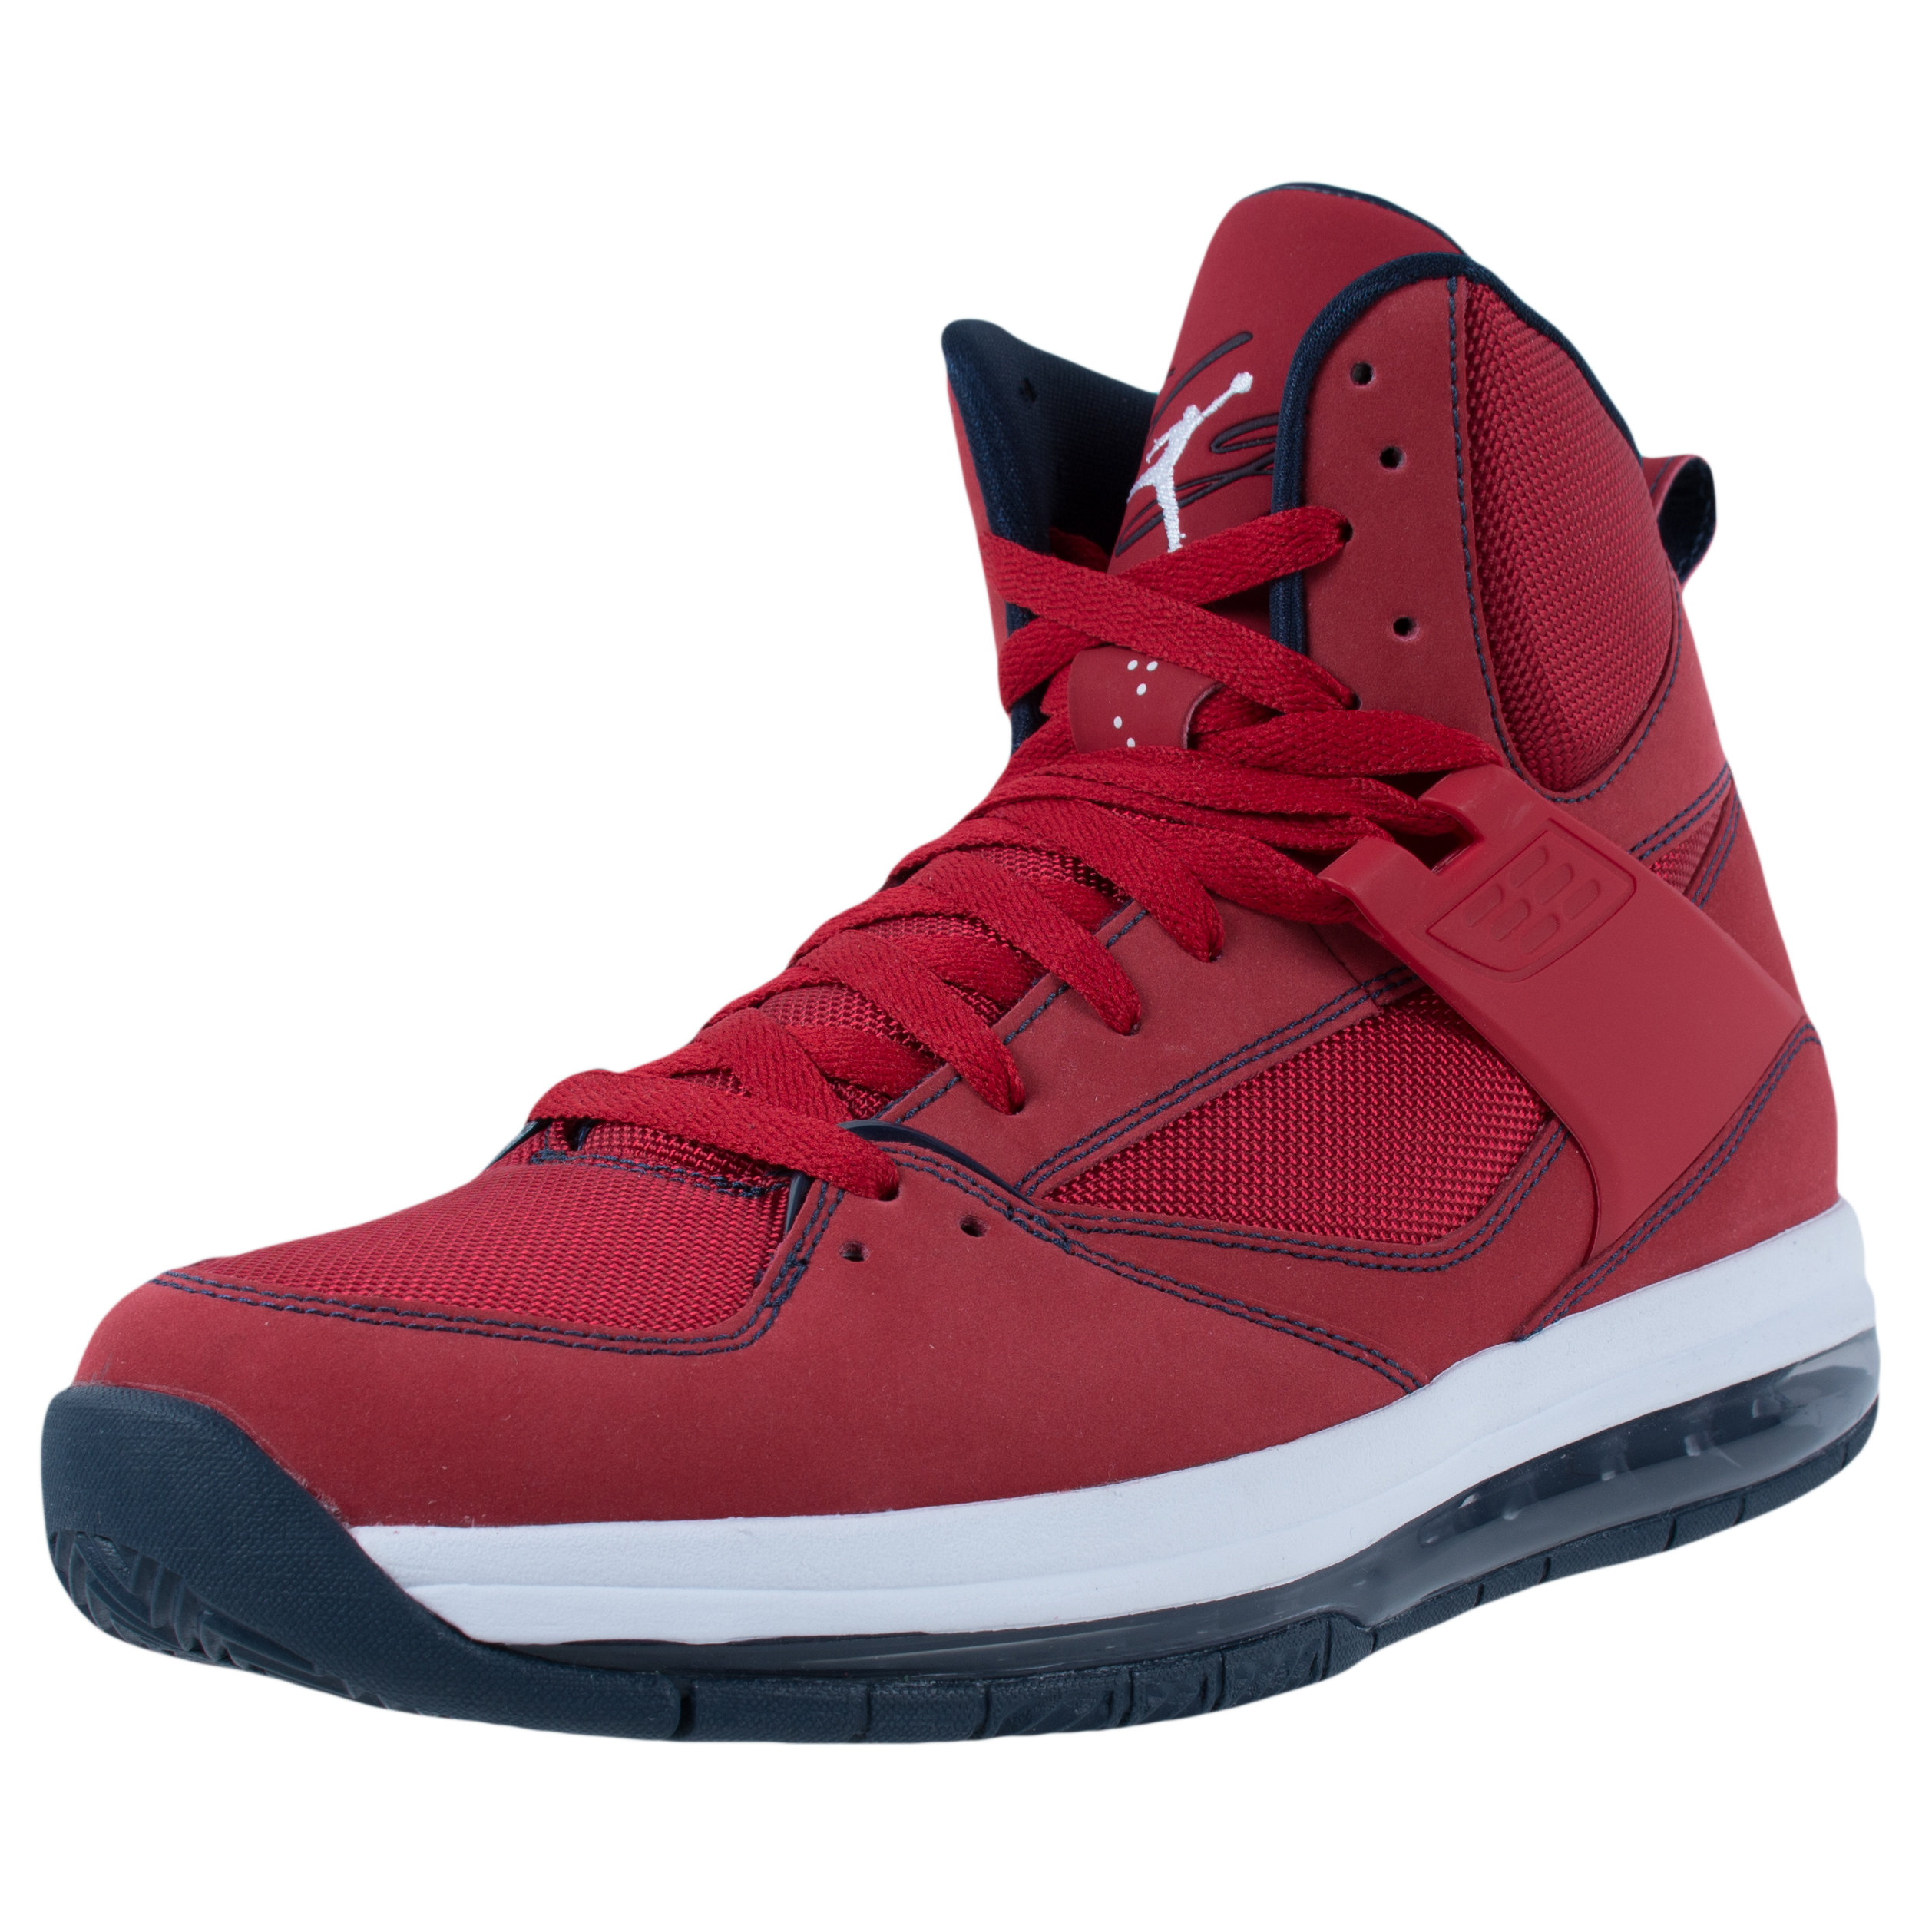 big sale 4f33f b04ca ... NIKE JORDAN FLIGHT 45 HIGH MAX CHRIS PAUL GYM RED OBSIDIAN WHITE 524866  601 Nike Air Jordan Flight 97 Black Wolf Grey ...